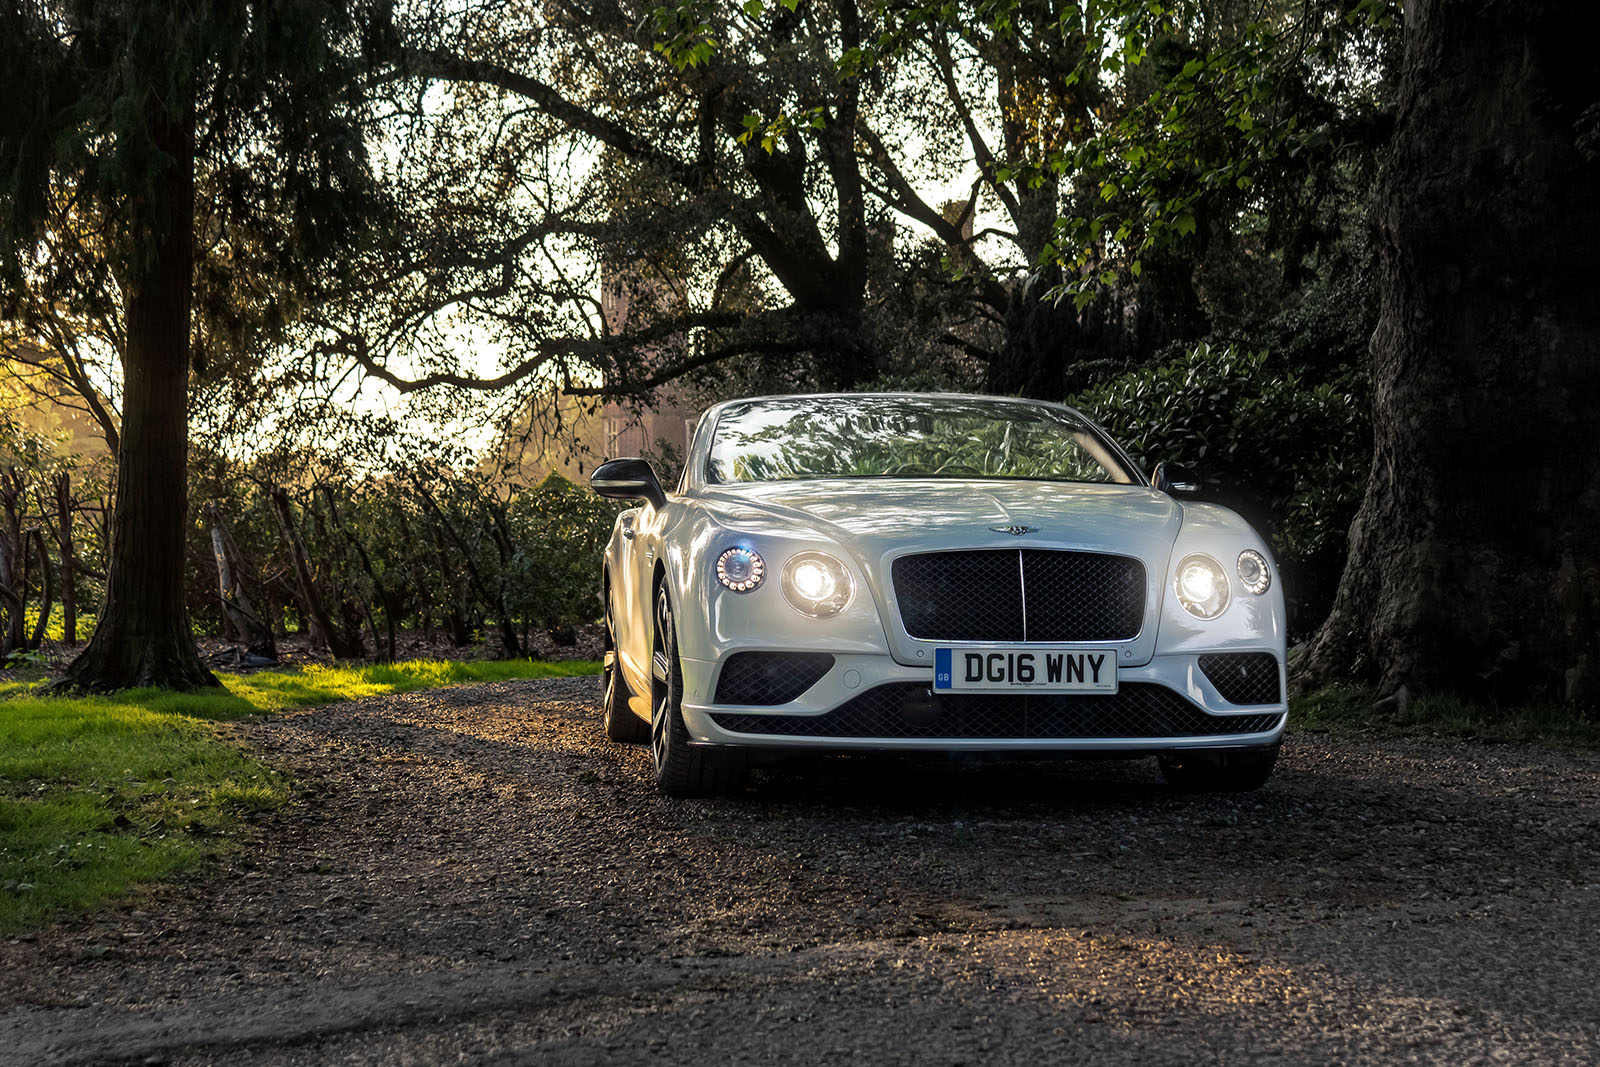 Top Down in The Bentley GTC V8S 2